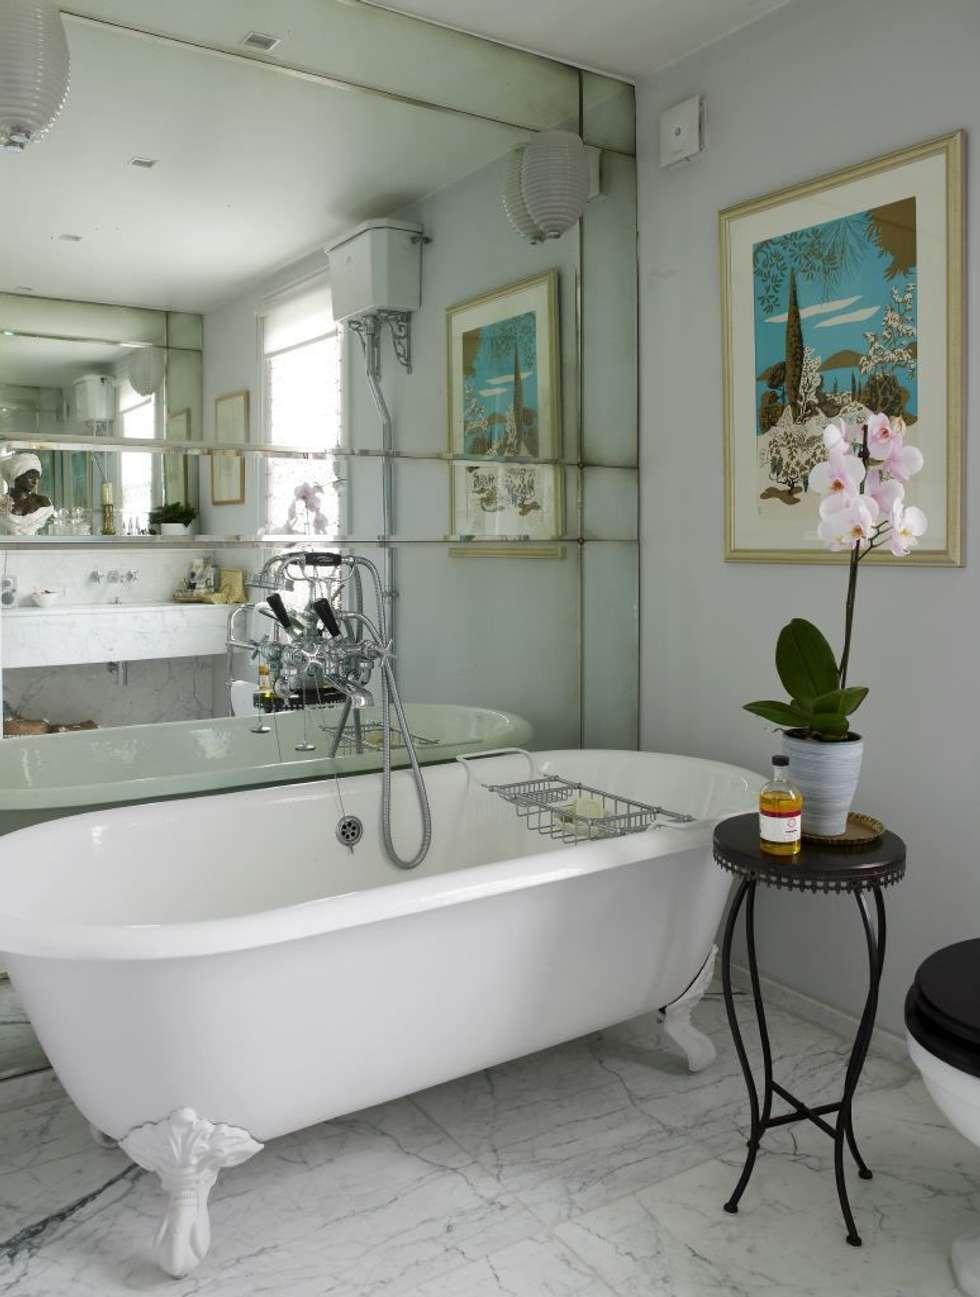 Interior design ideas redecorating remodeling photos homify - Deco badkamer vintage ...